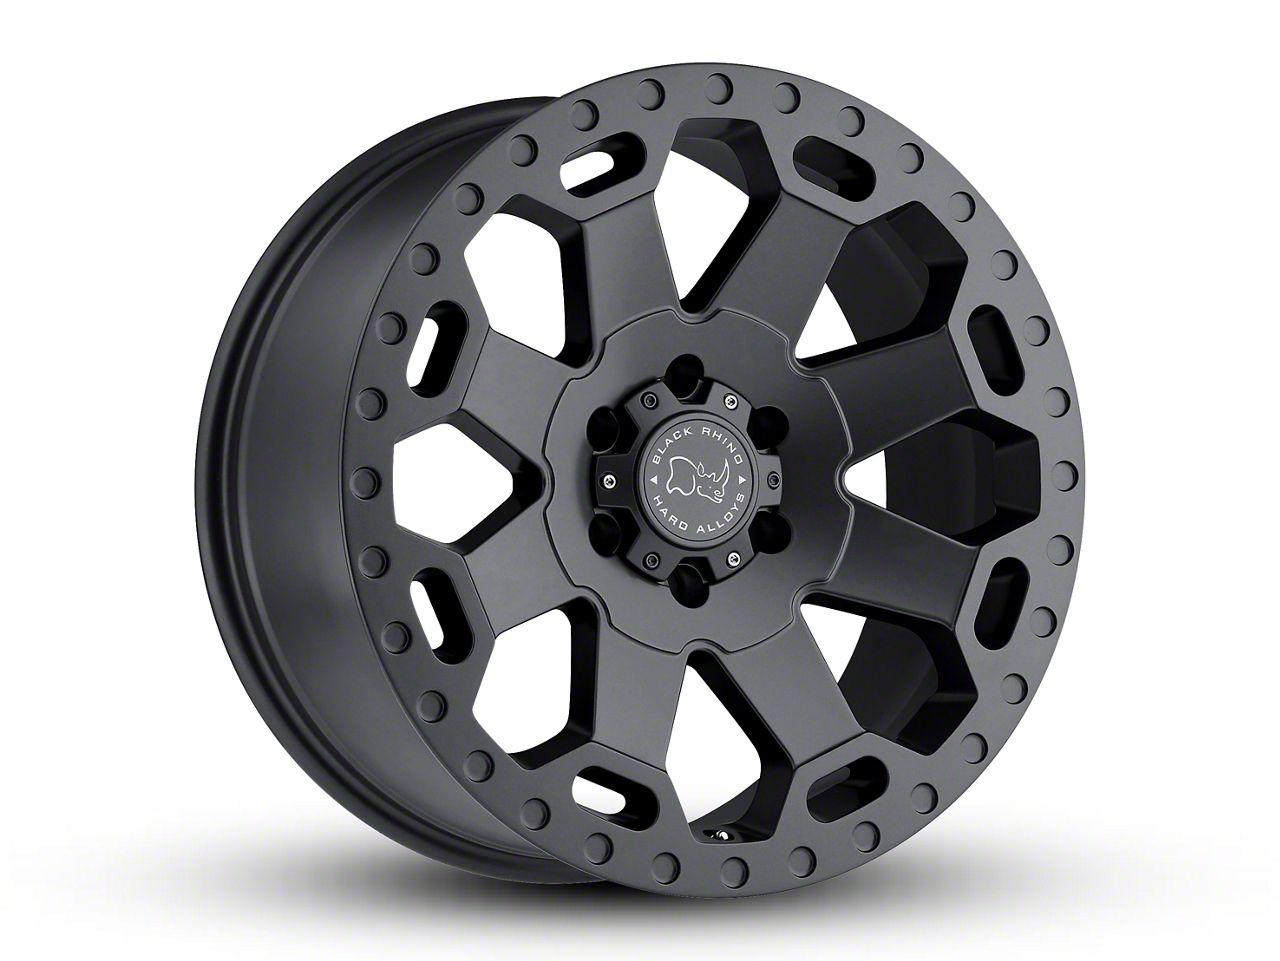 Black Rhino Warlord Matte Gunmetal 5-Lug Wheel - 17x9 (02-18 RAM 1500, Excluding Mega Cab)